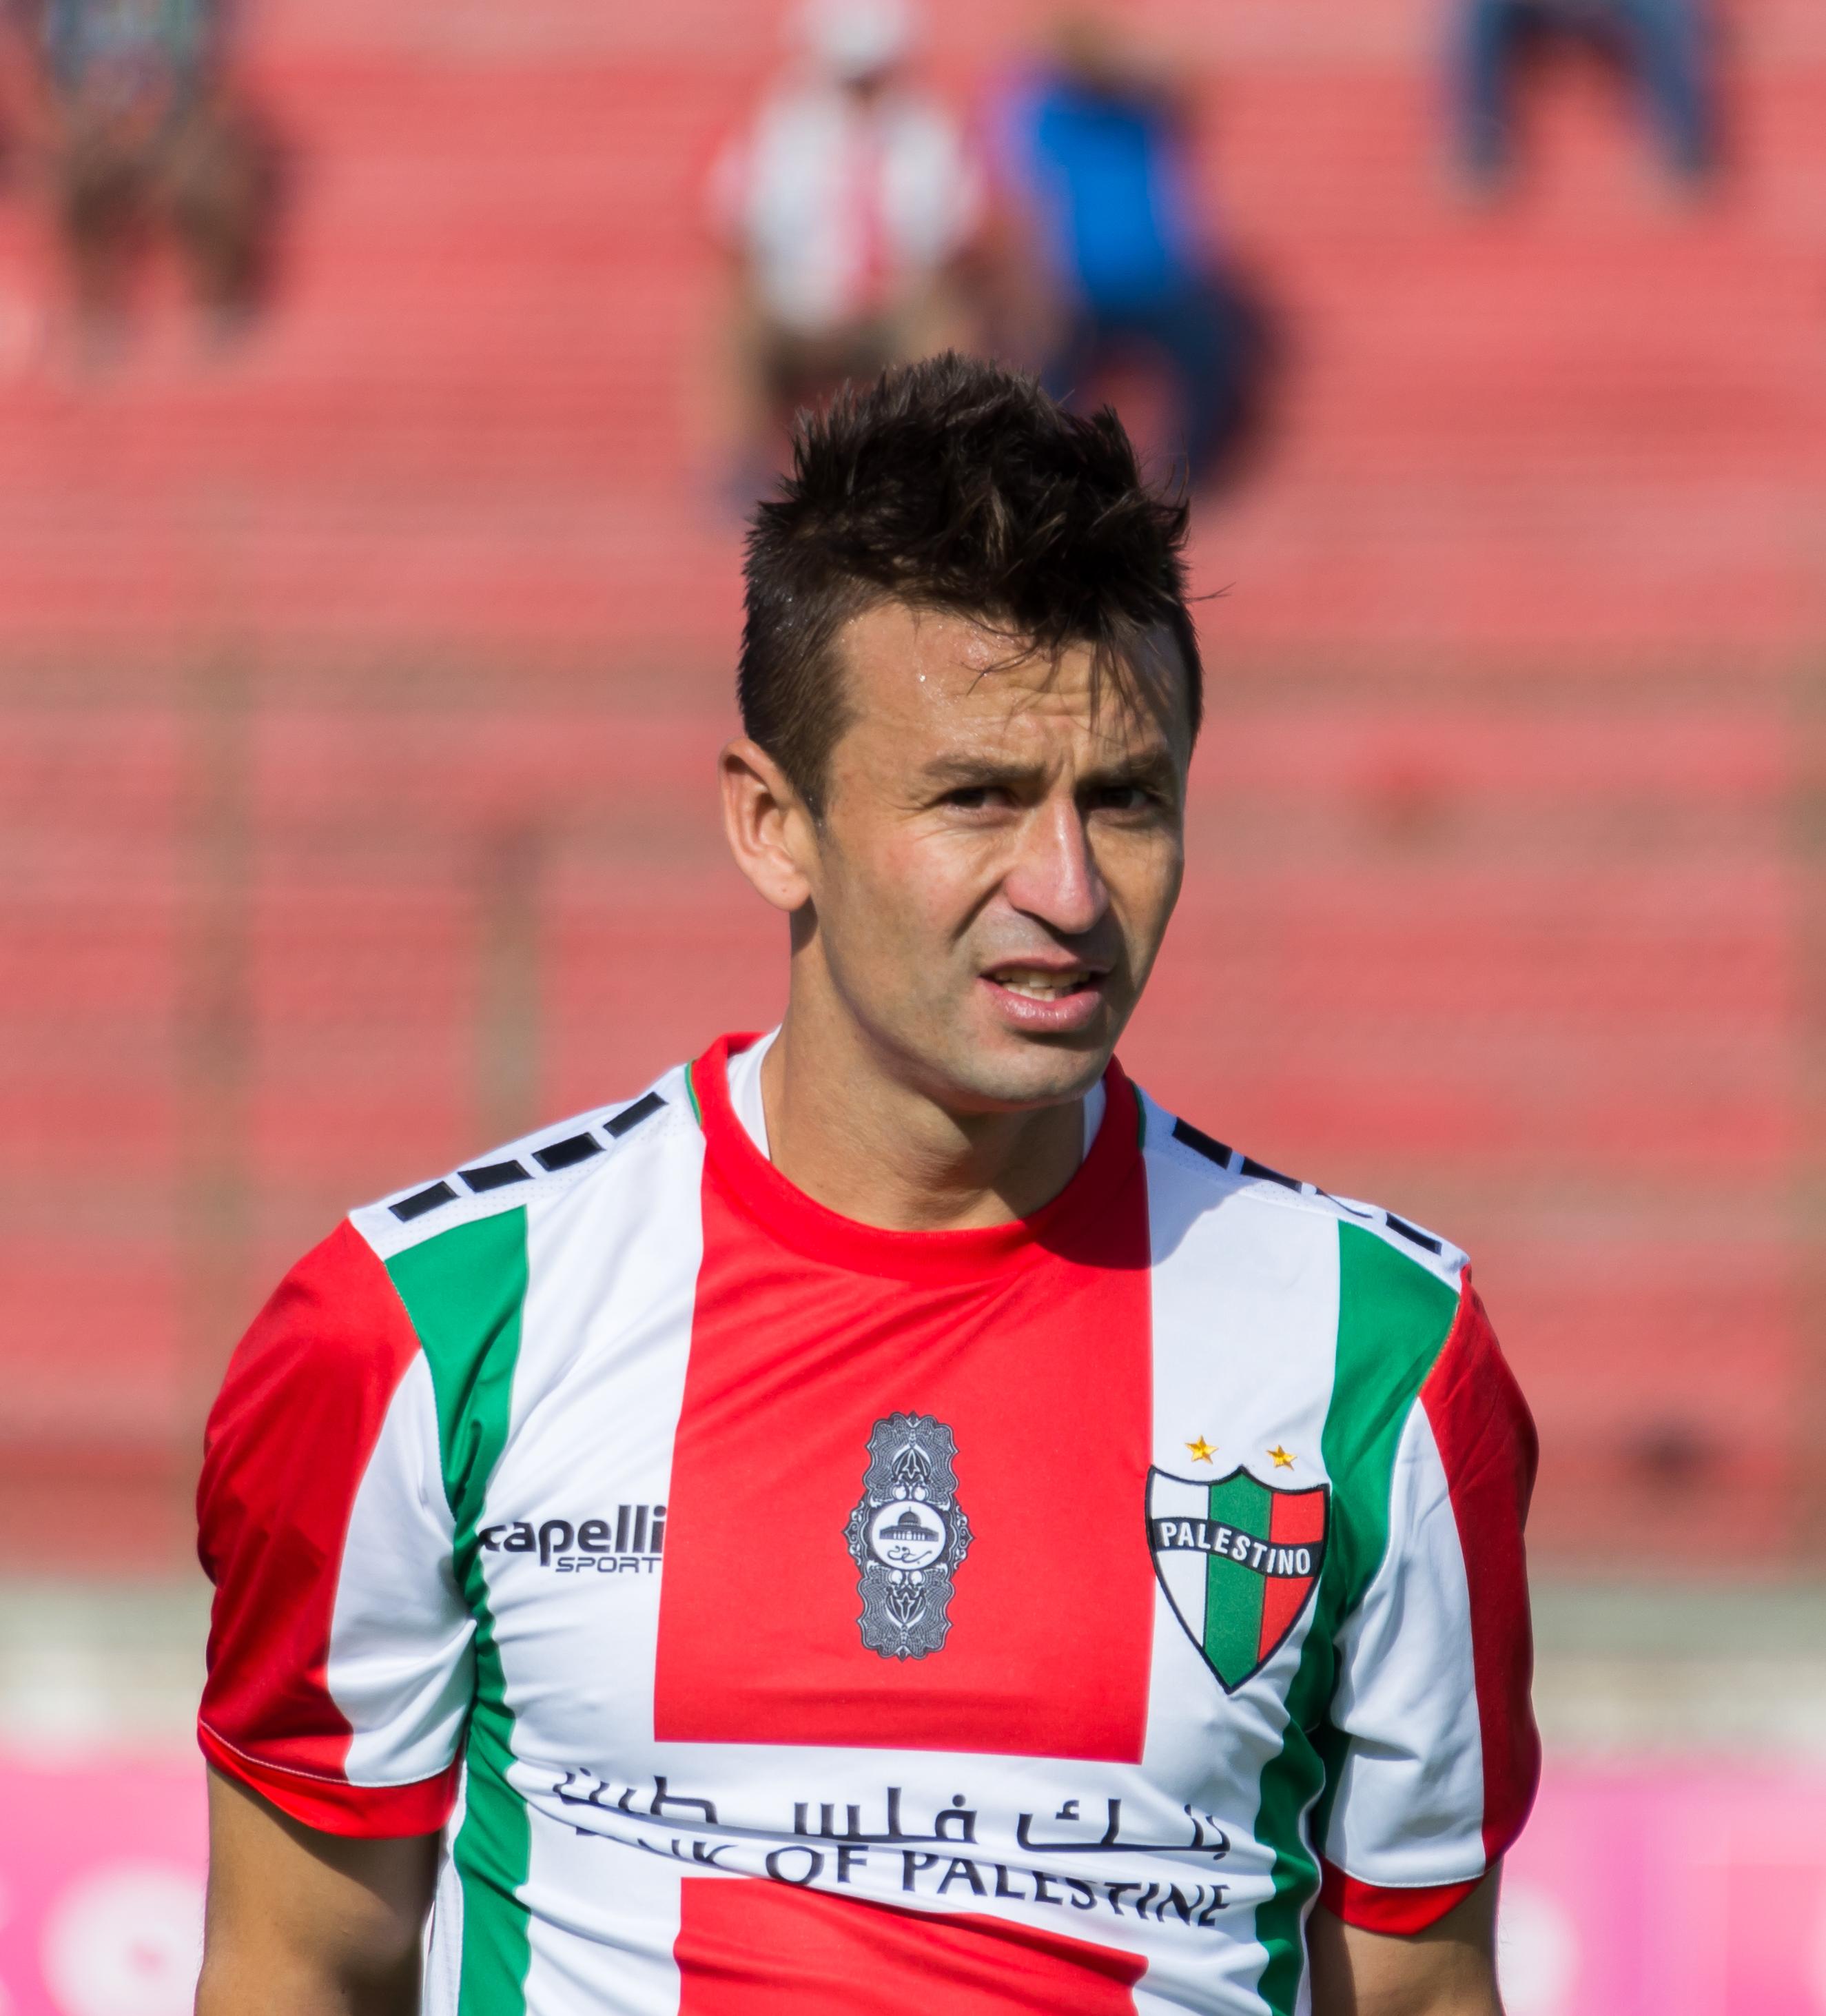 Roberto Gutiérrez